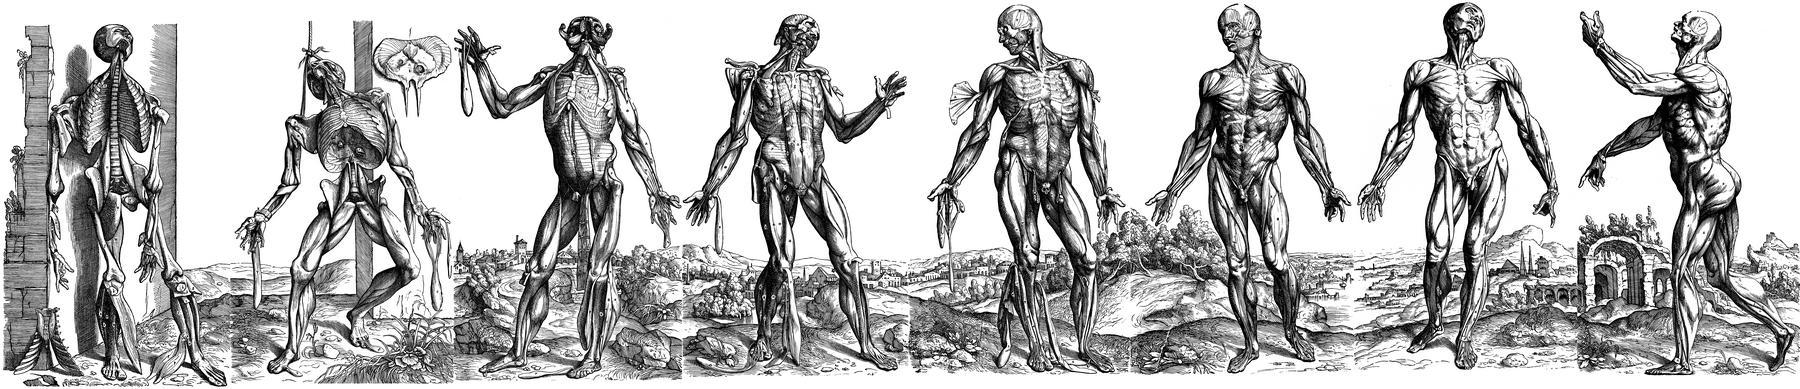 "The landscape panorama of Vesalius' ""Muscle Men"""